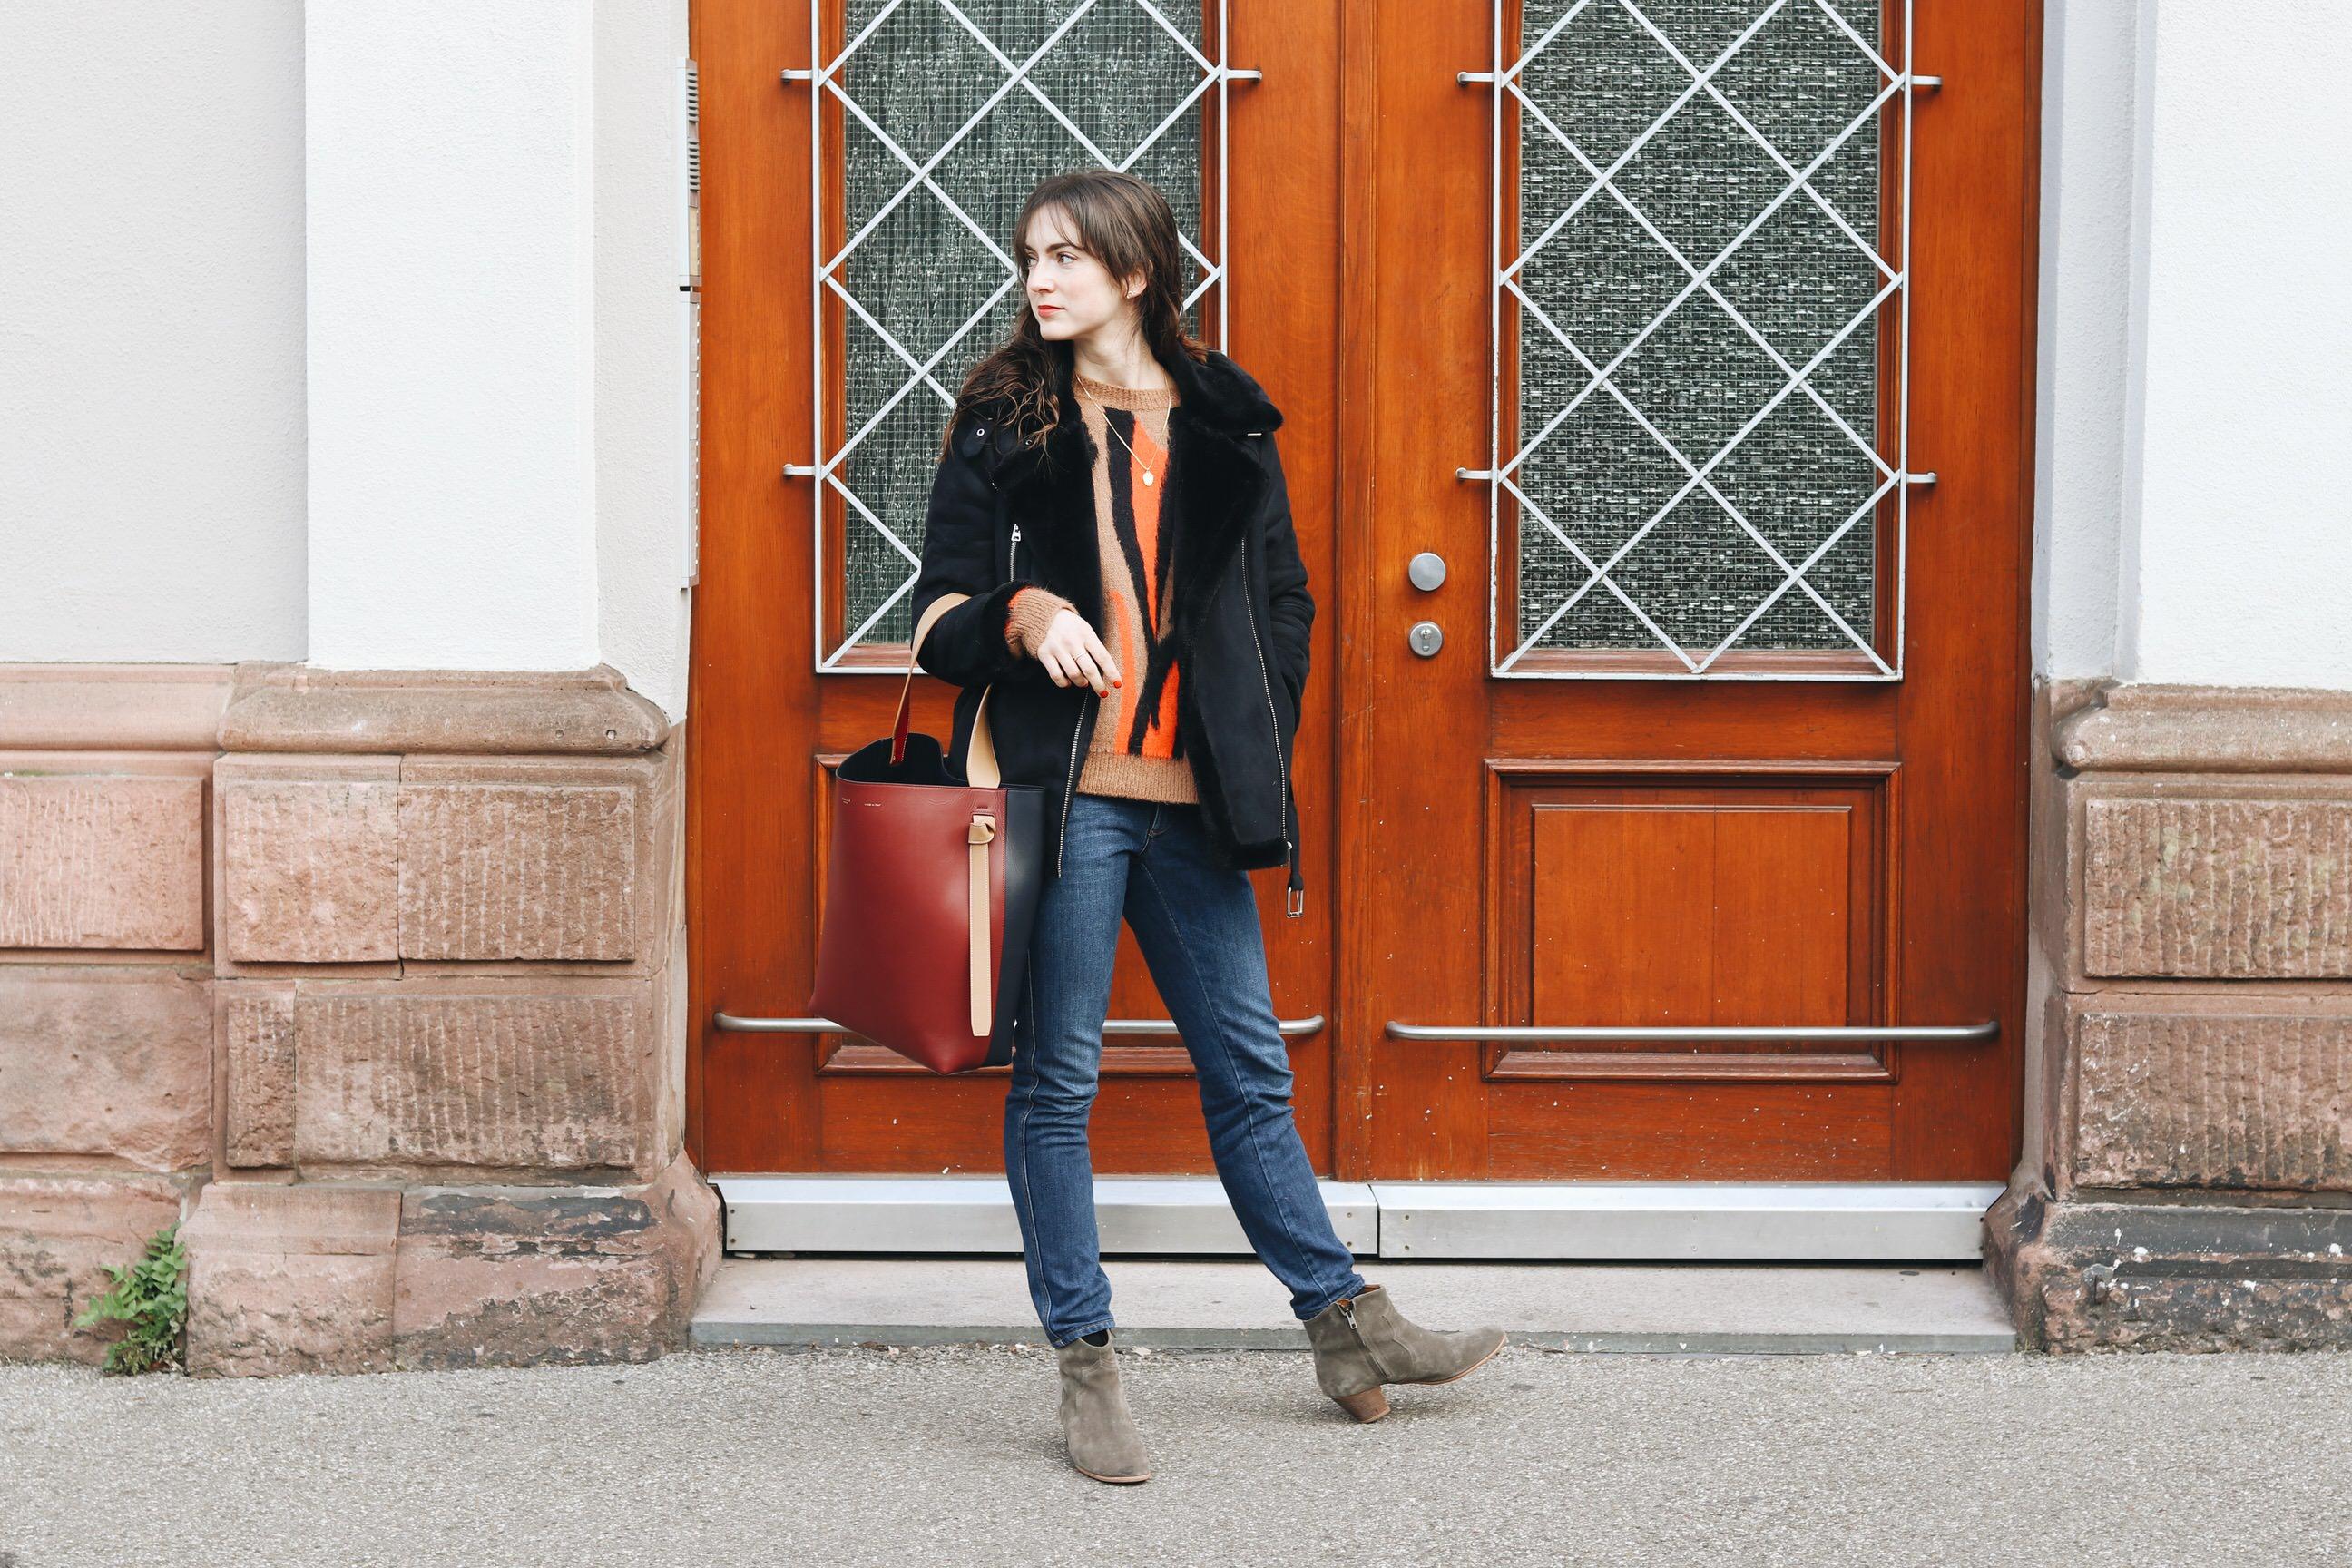 Modeblog Outfit Streetstyle Winter Look schwarze Felljacke Strickpullover Stiefeletten Fashionblog deutsch Instagram Bloggerin